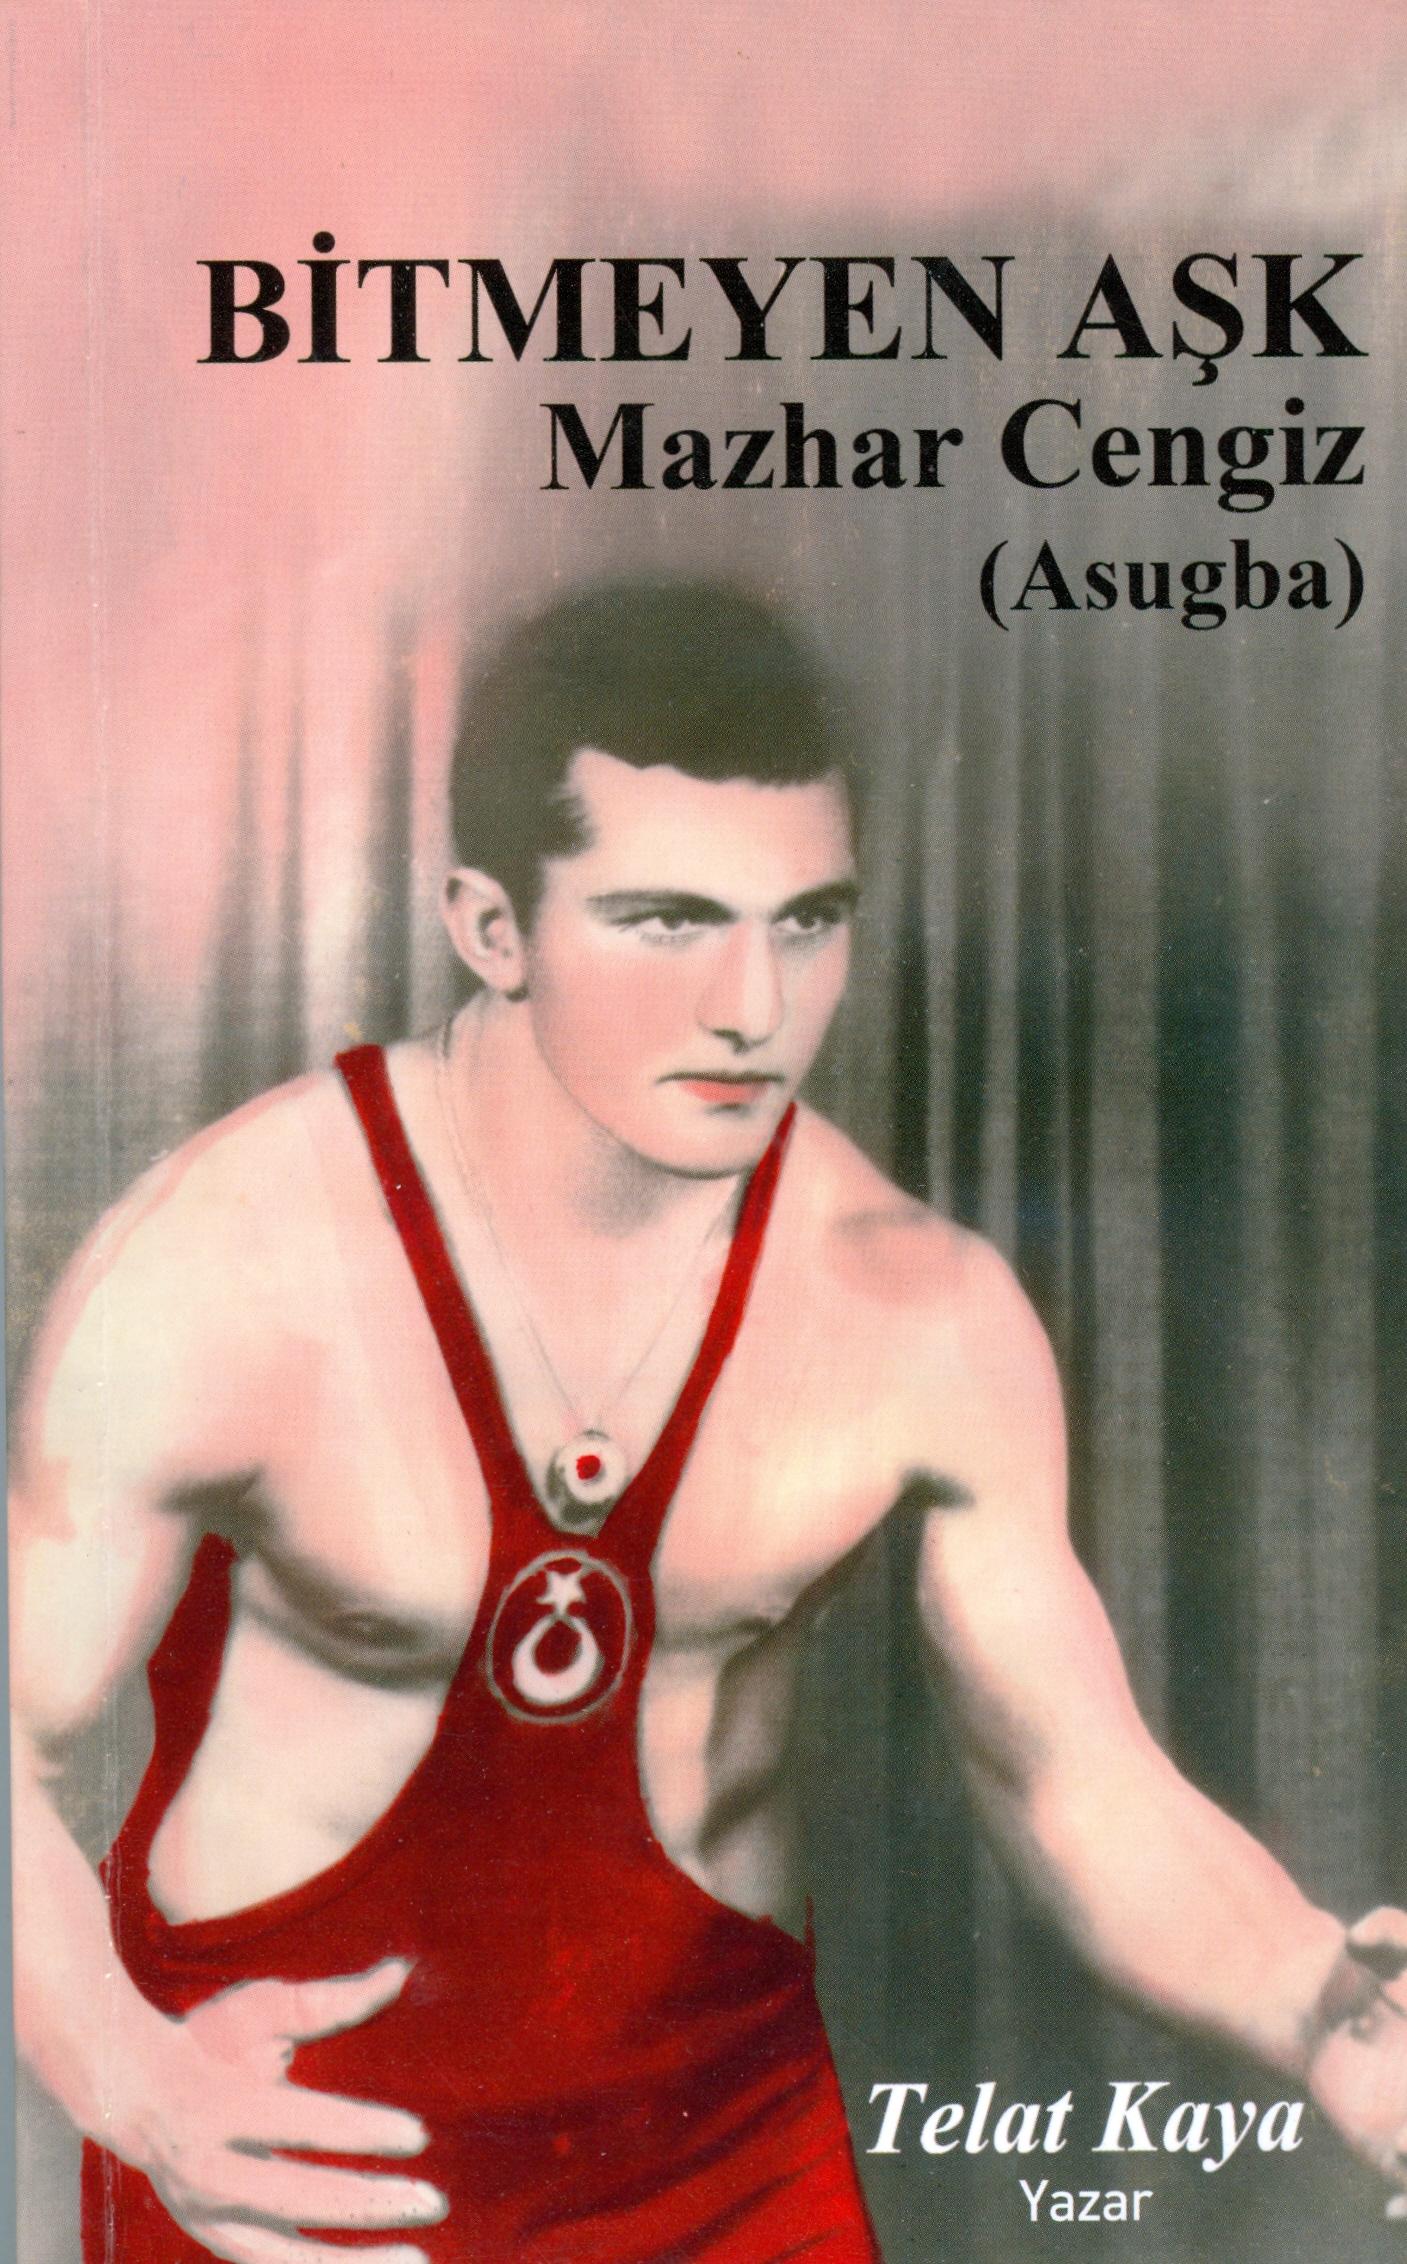 Bitmeyen Aşk, Mazhar Cengiz (Asugba)